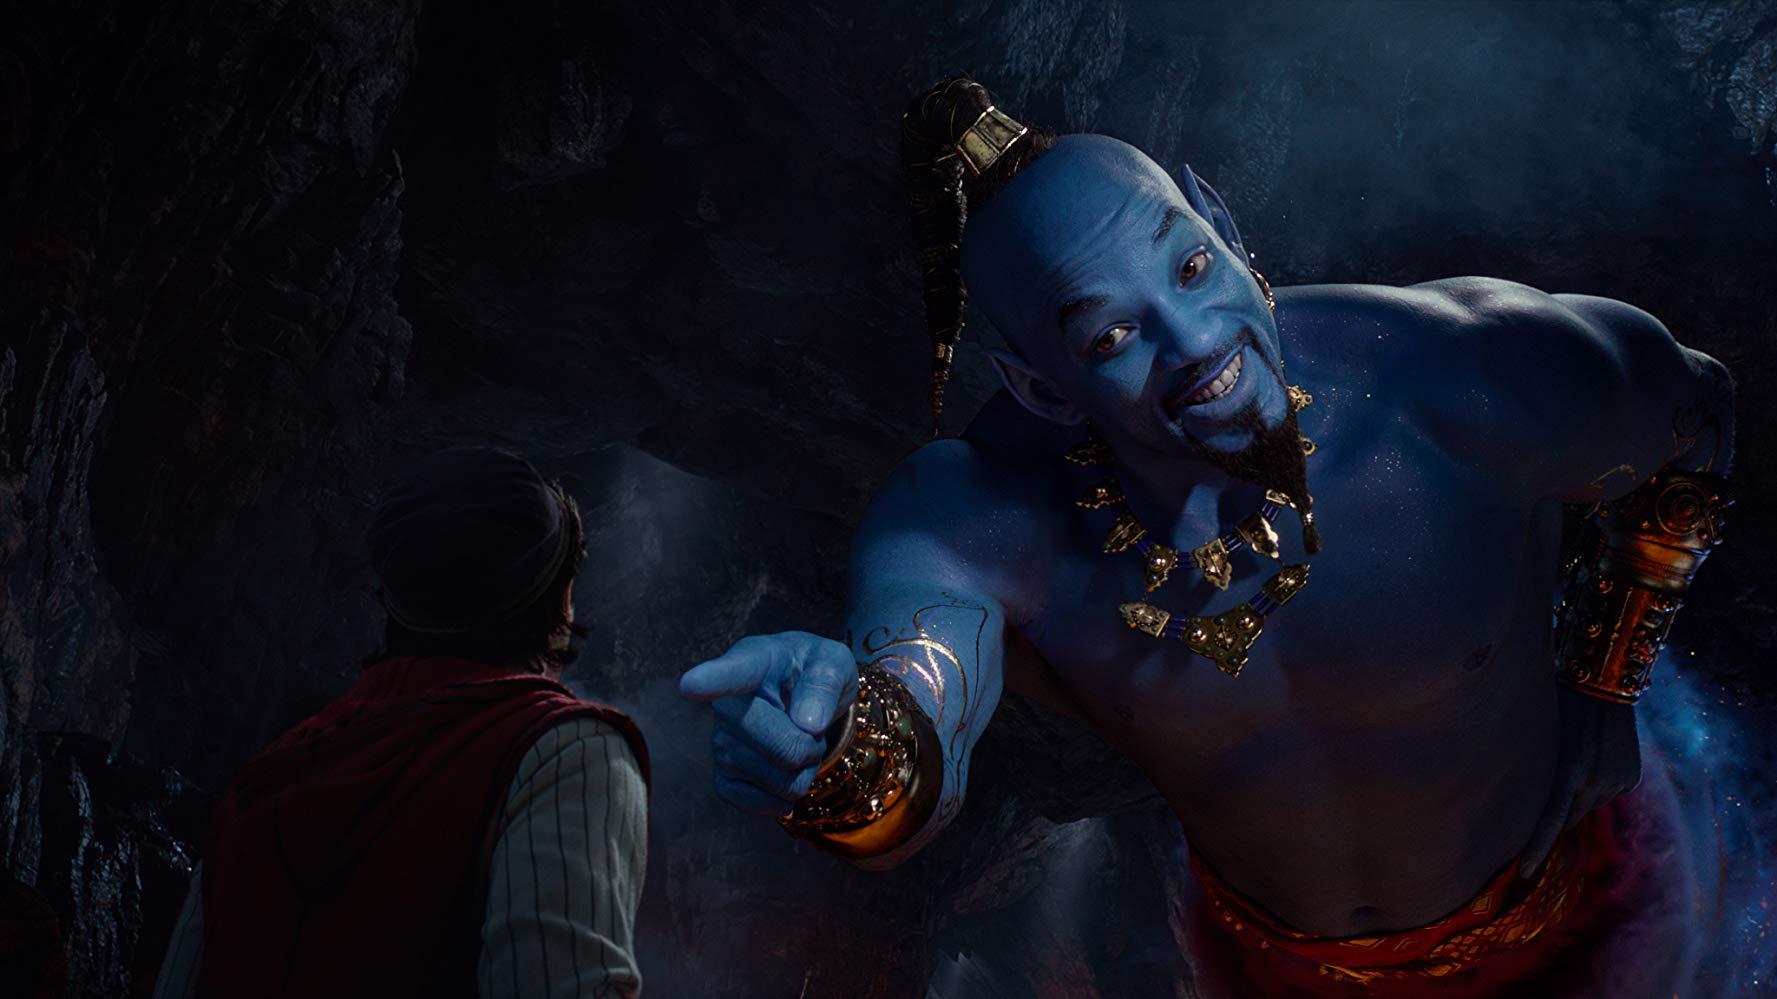 Mena Massoud and Will Smith in Aladdin